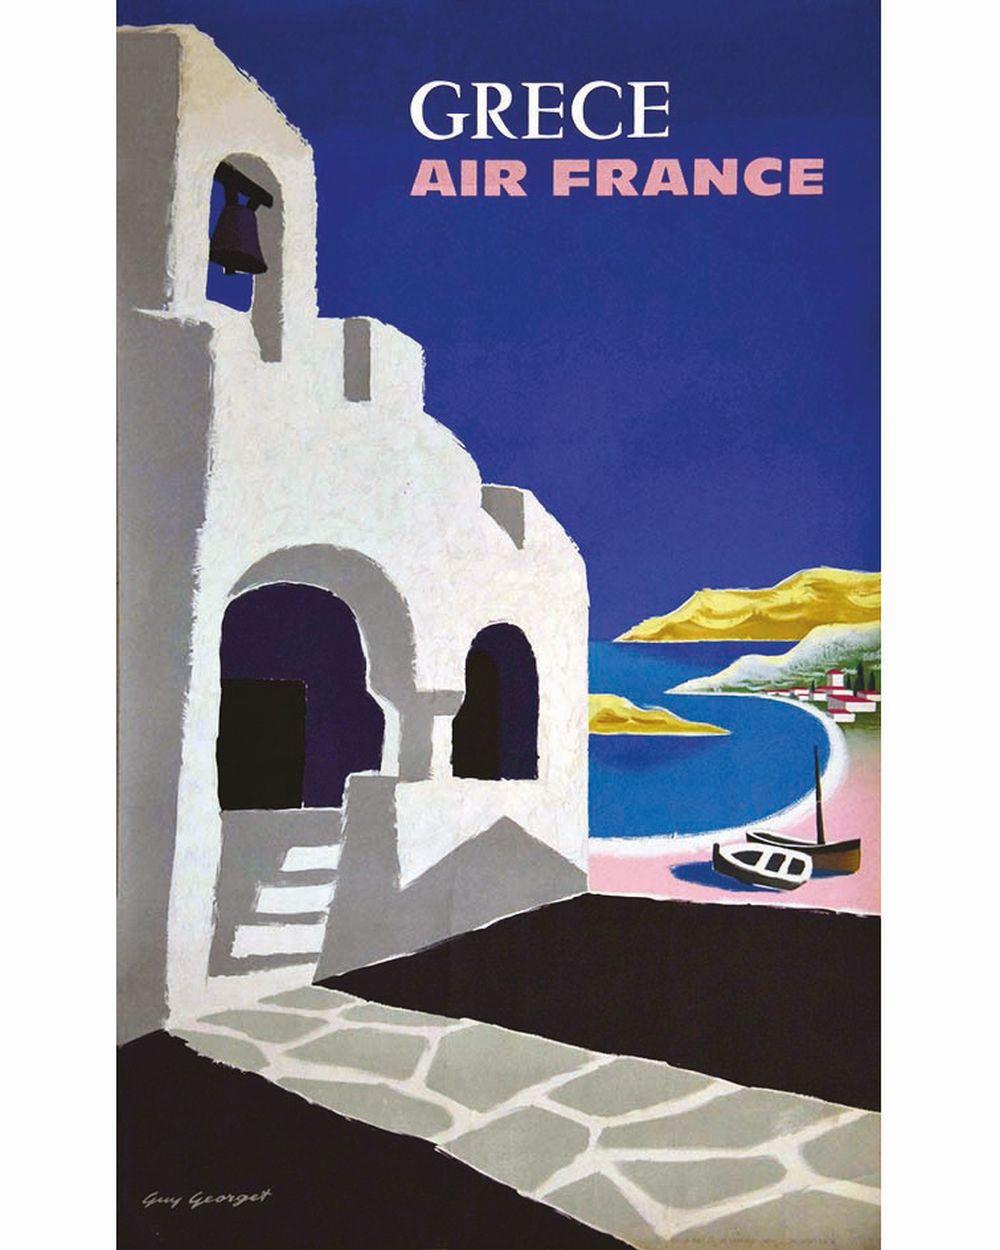 GEORGET GUY - Grece Air France     1960